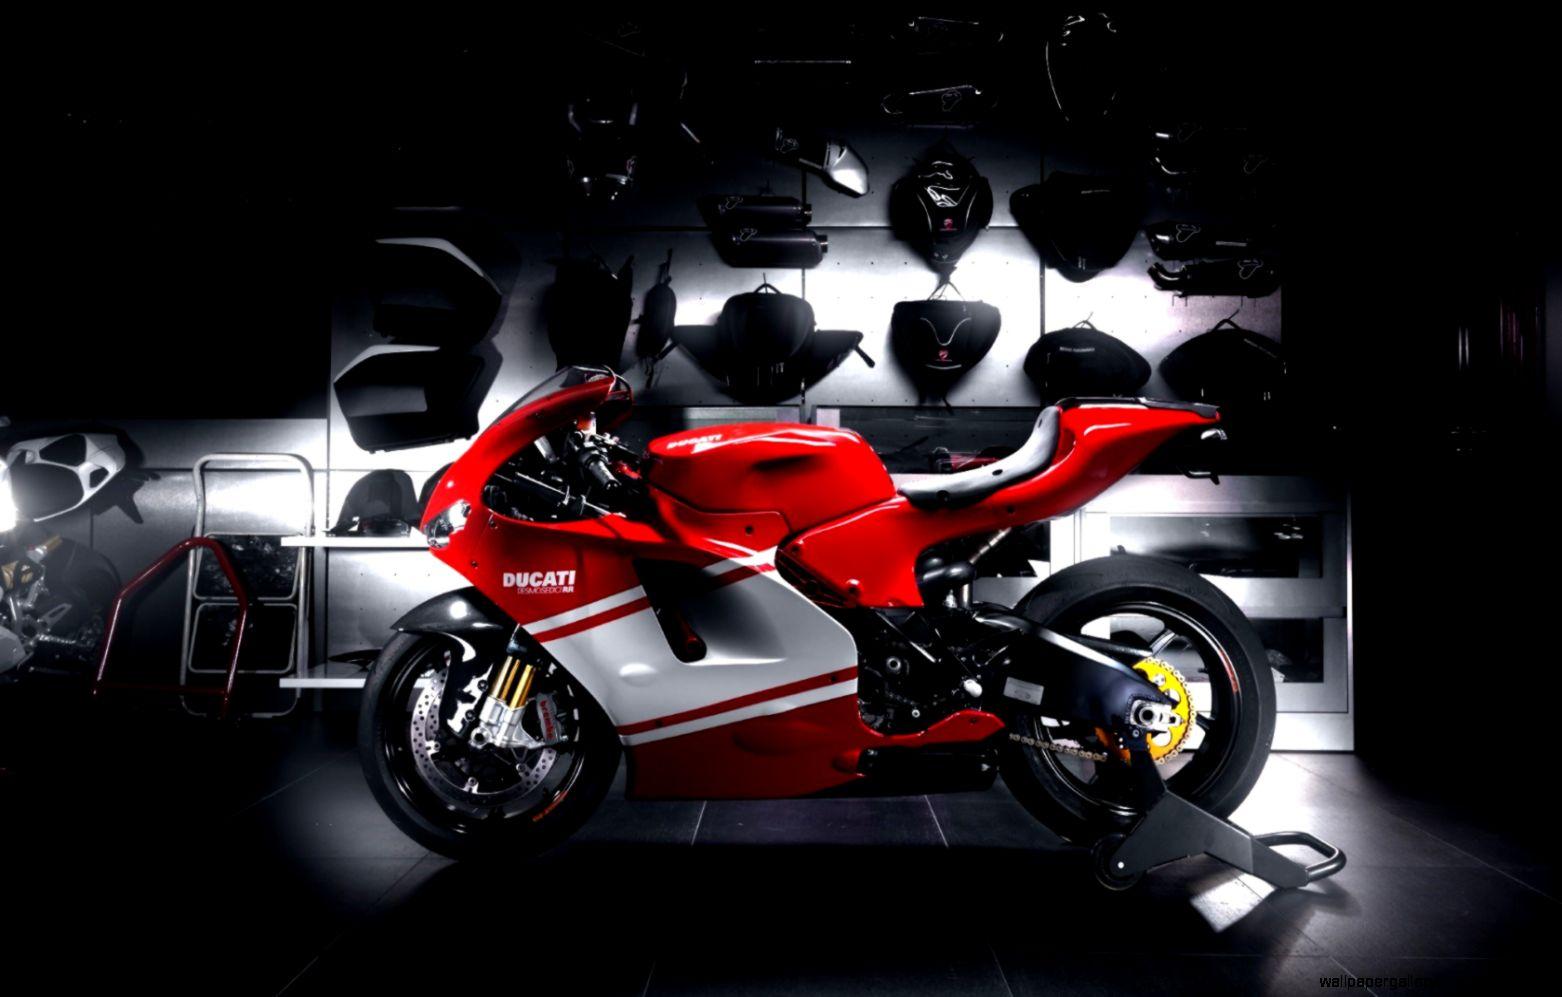 Motorcycle Red Ducati Desmosedici Hd Wallpaper 25662 Wallpaper